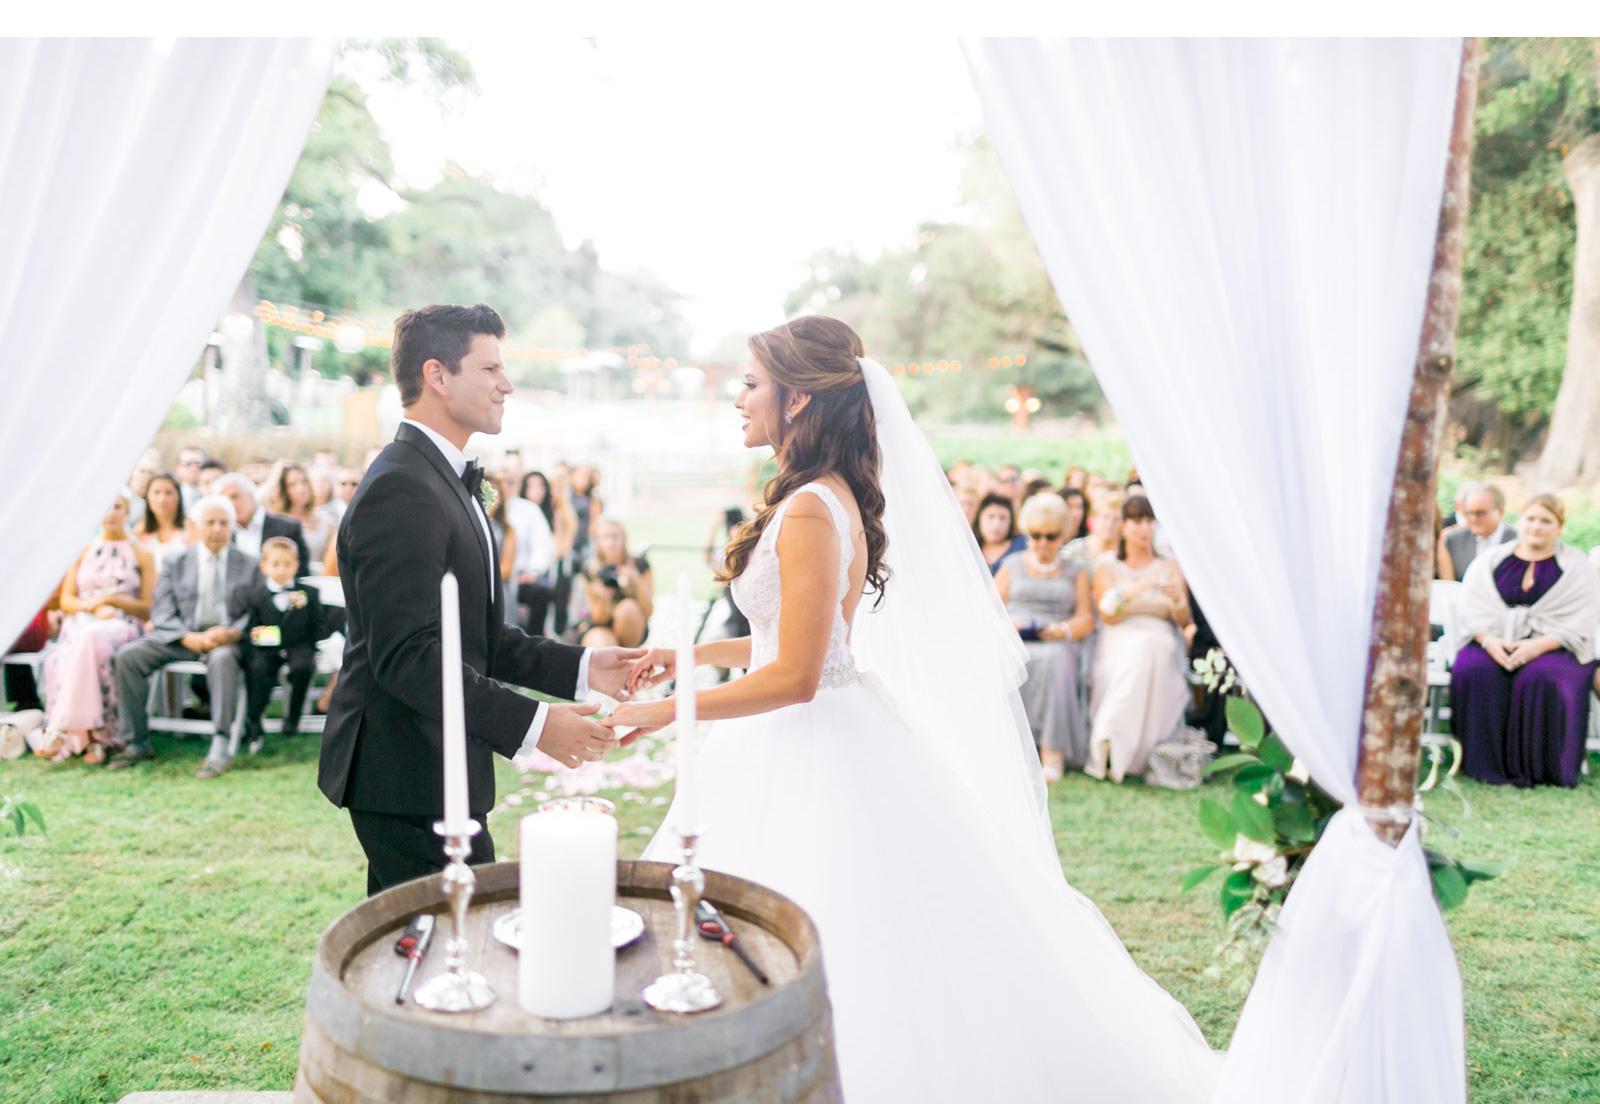 Nia-Sanchez-Miss-USA-Temecula-Wedding-Natalie-Schutt-Photography_06.jpg